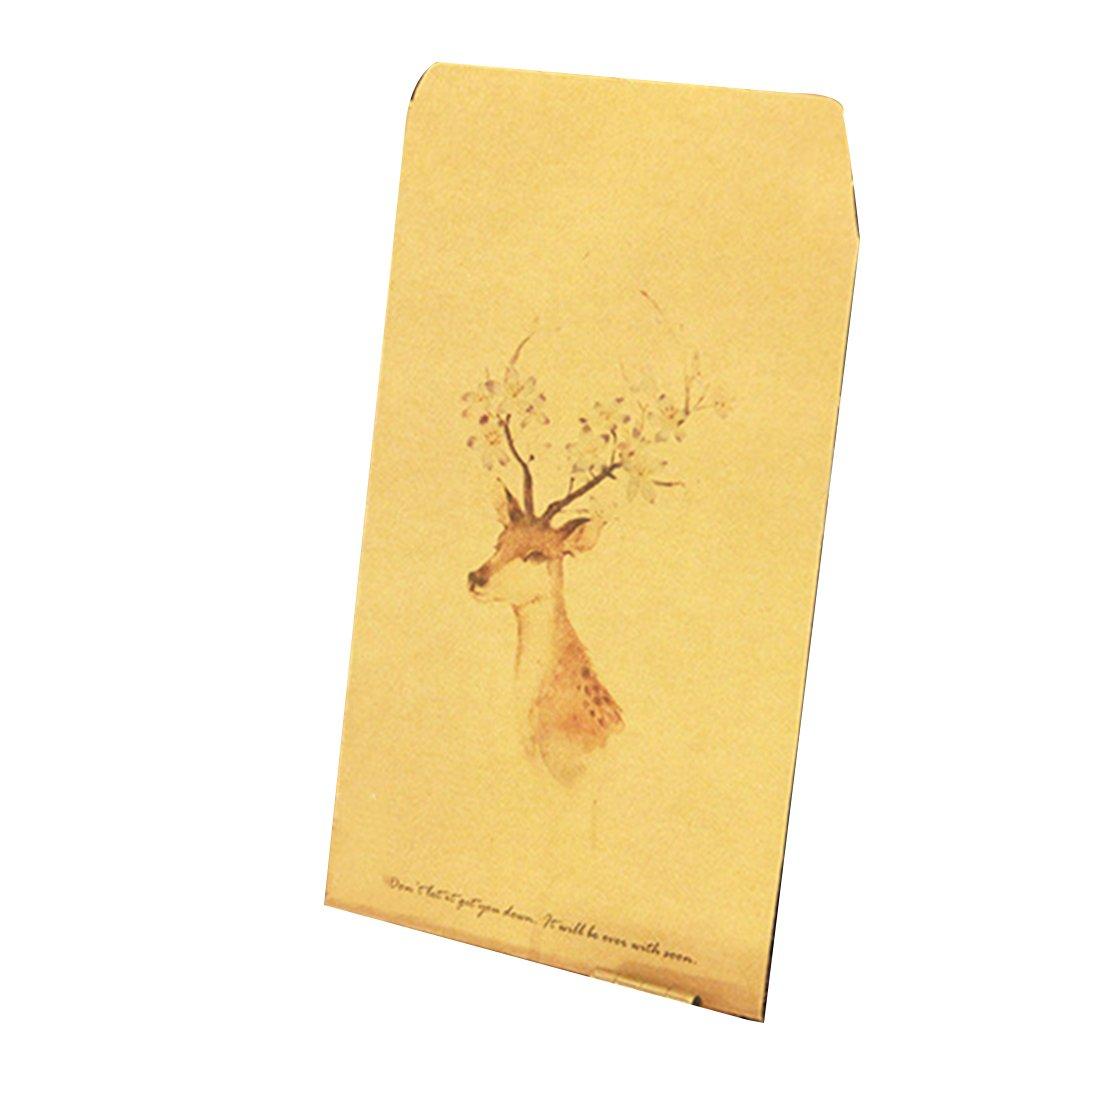 Td stores Deer Paper Envelope Cute Mini Envelopes Vintage by Td stores (Image #1)